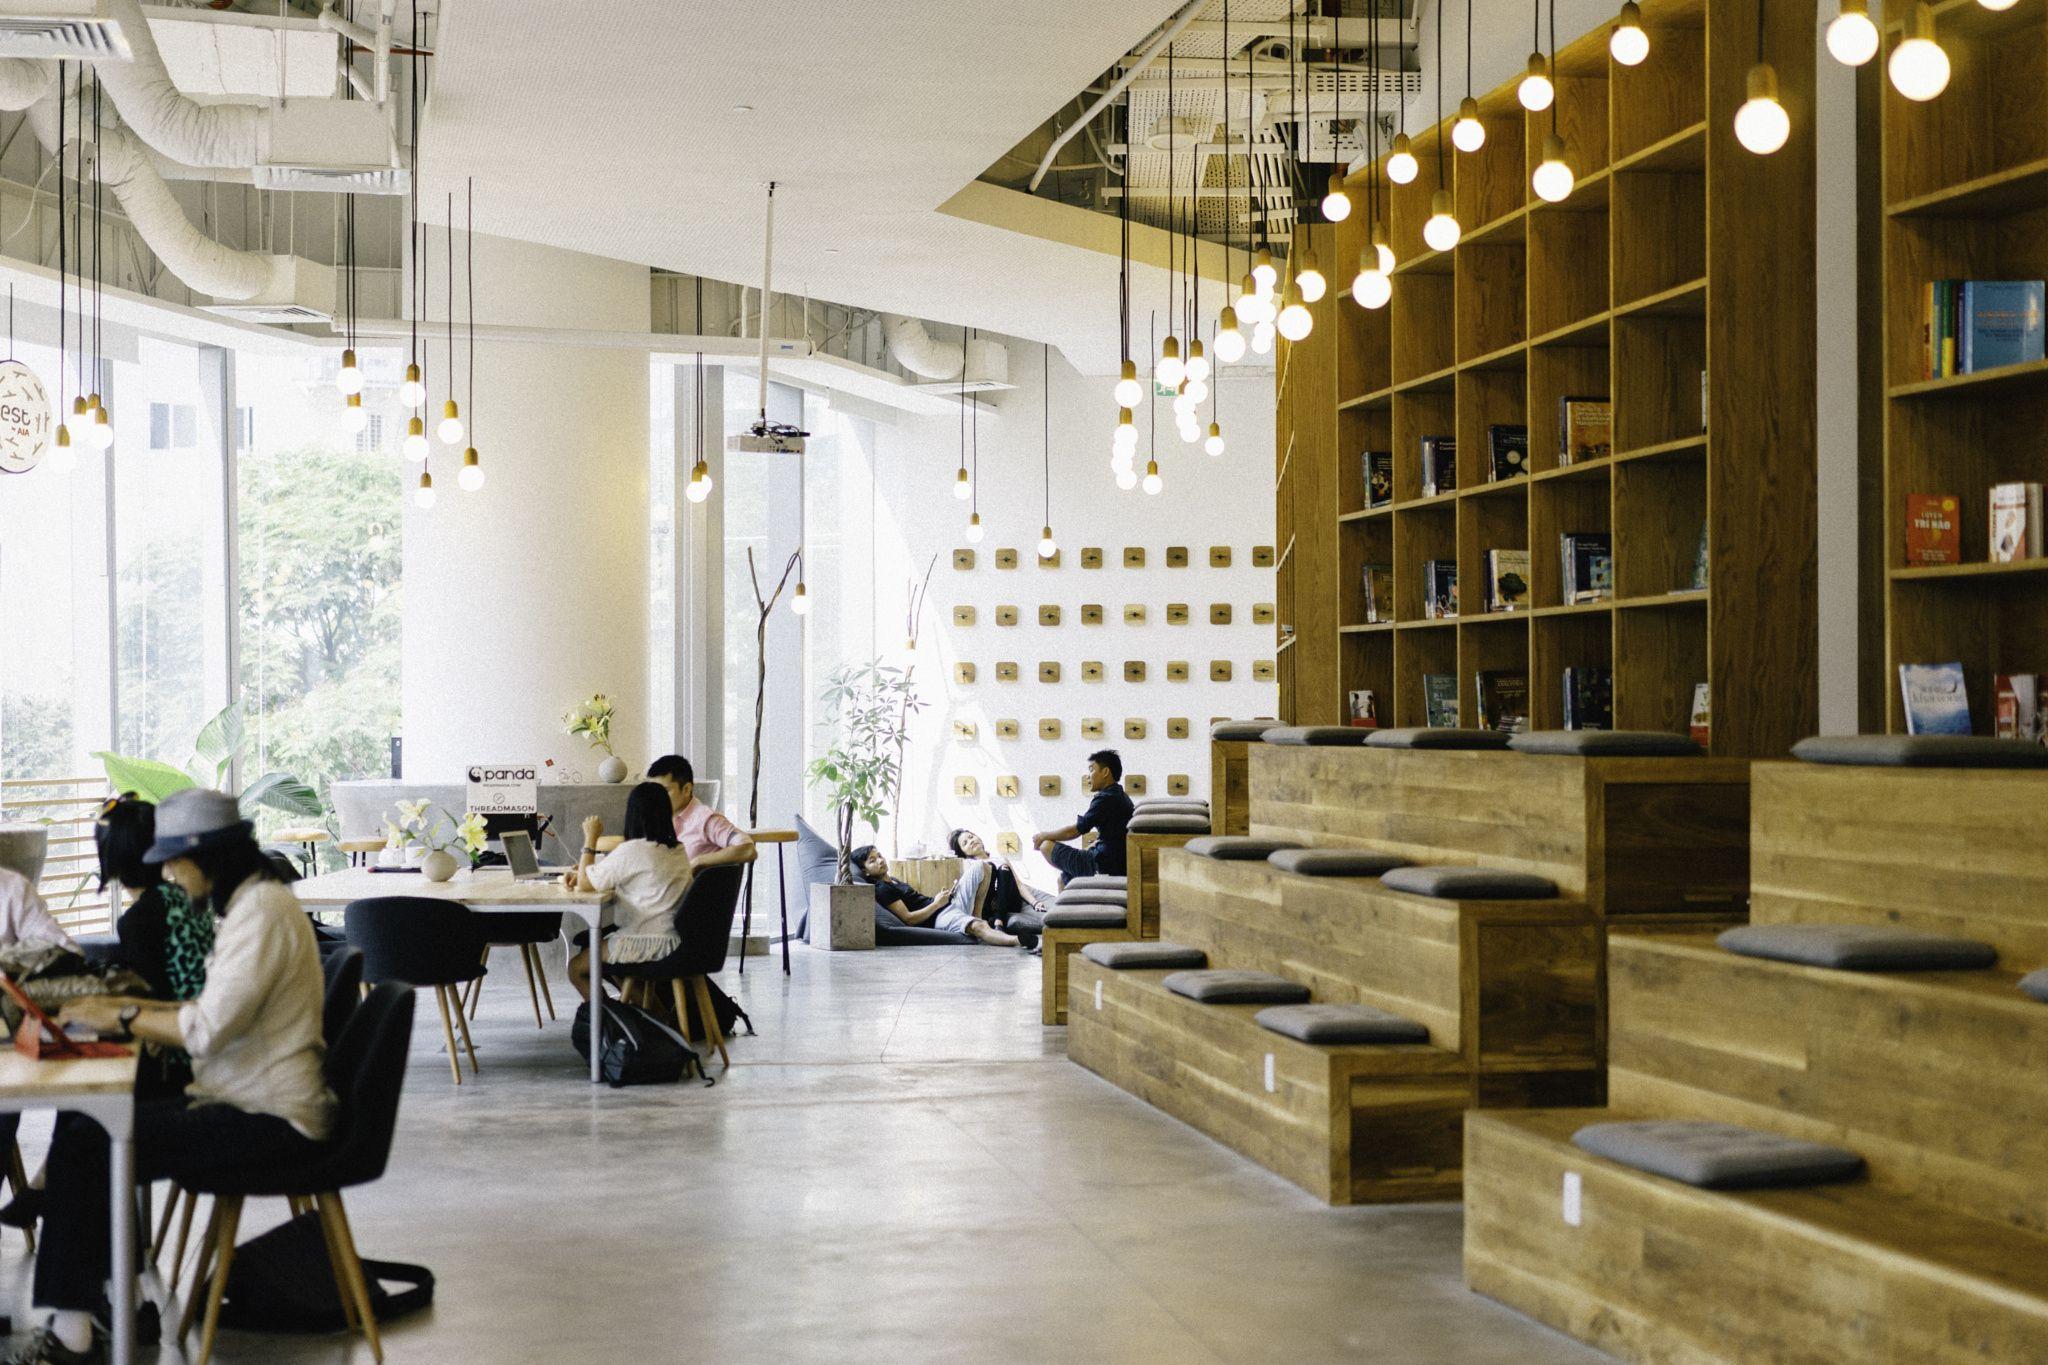 WORK Cafe Saigon | Work cafe, Coffee shop design, Coworking space